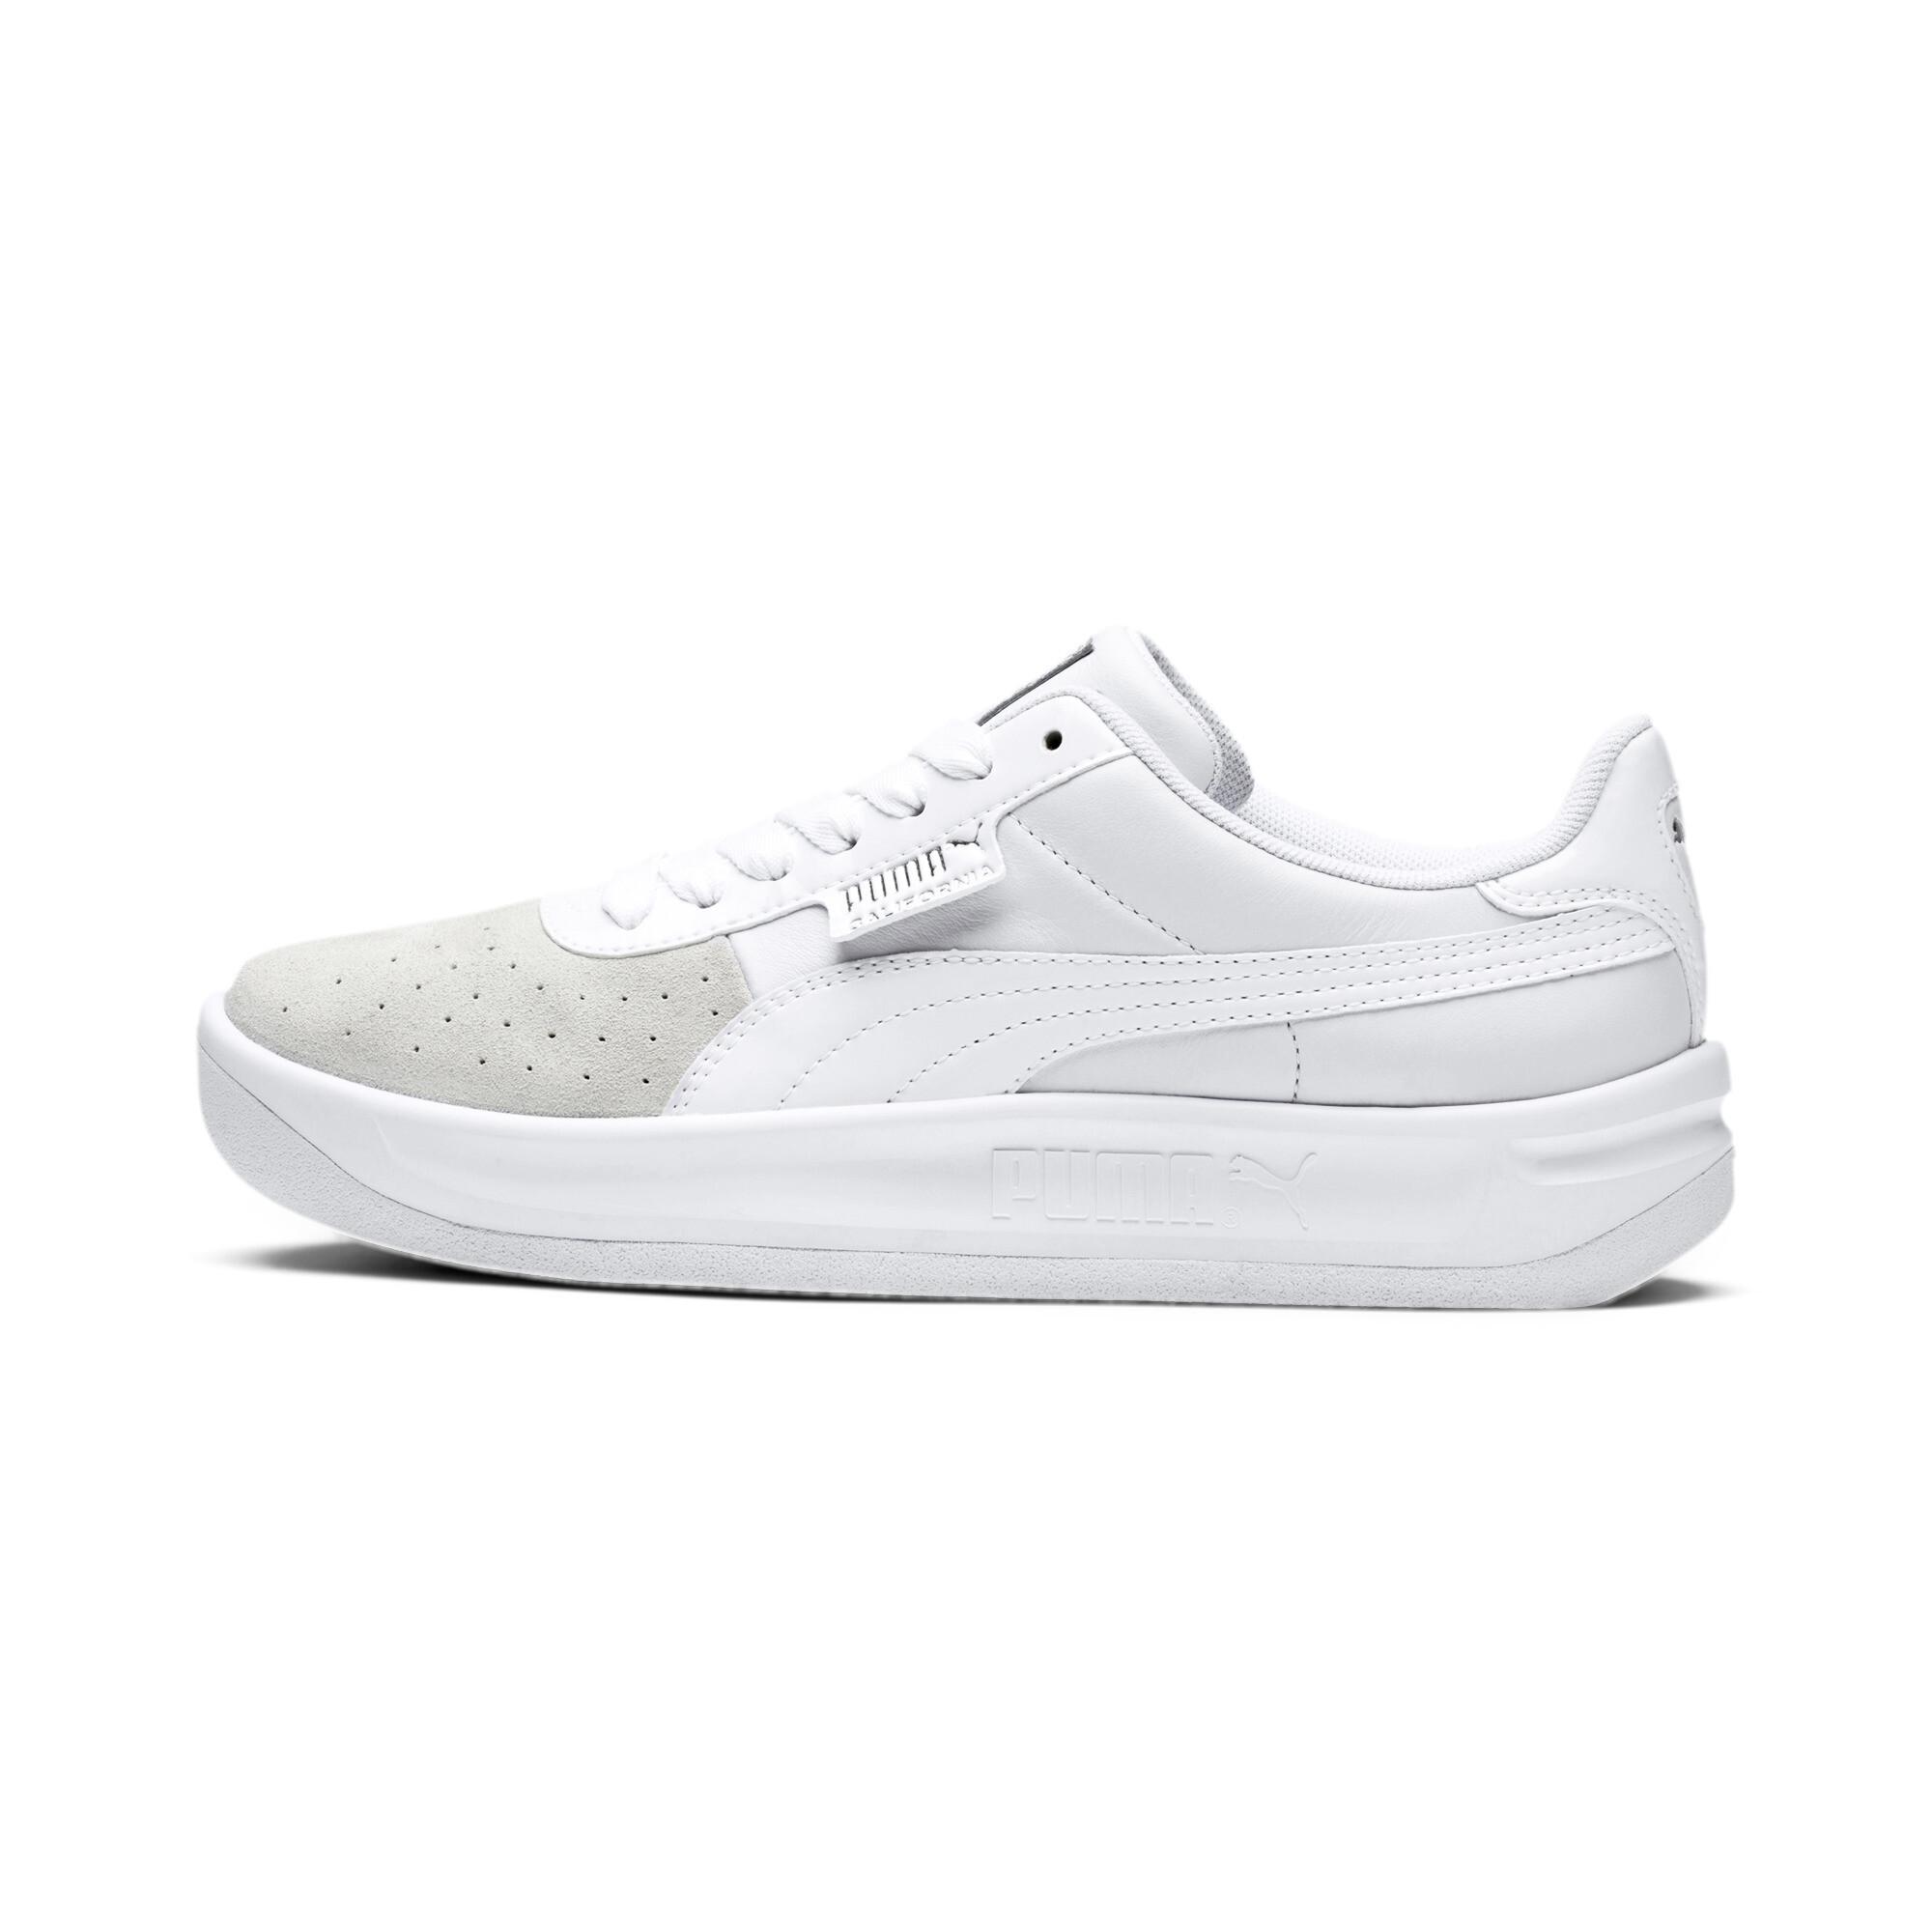 PUMA-Women-039-s-California-Monochrome-Sneakers thumbnail 9